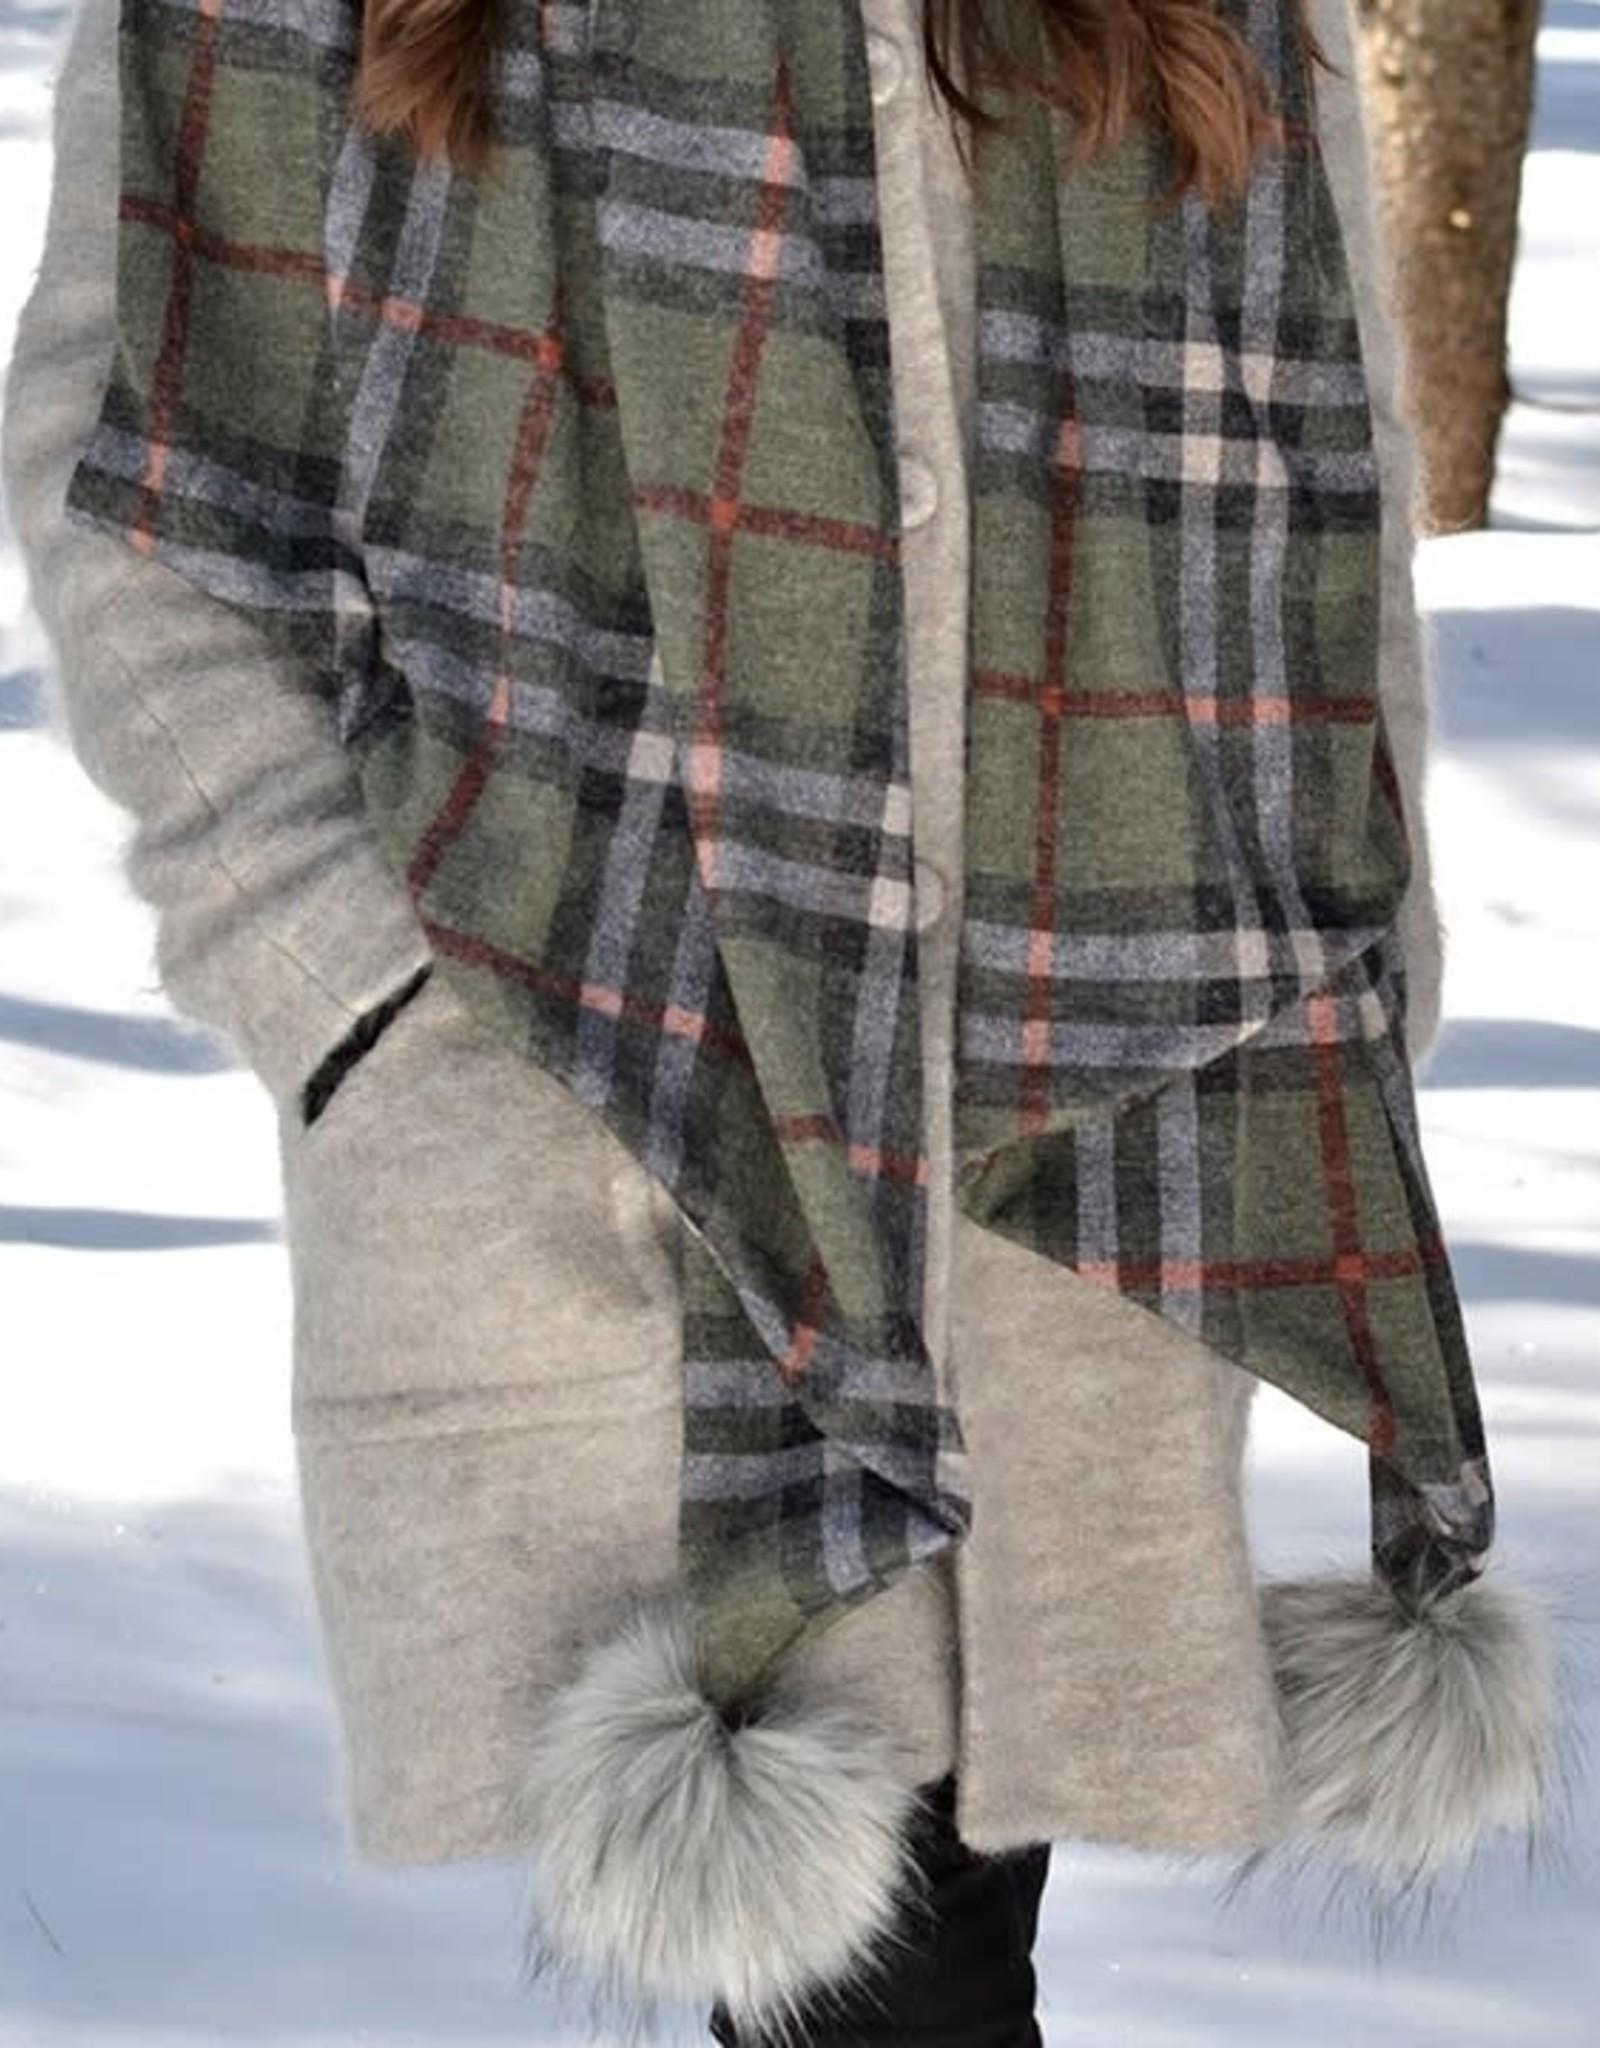 Baluchon Grand foulard + pompon # 1610-1331